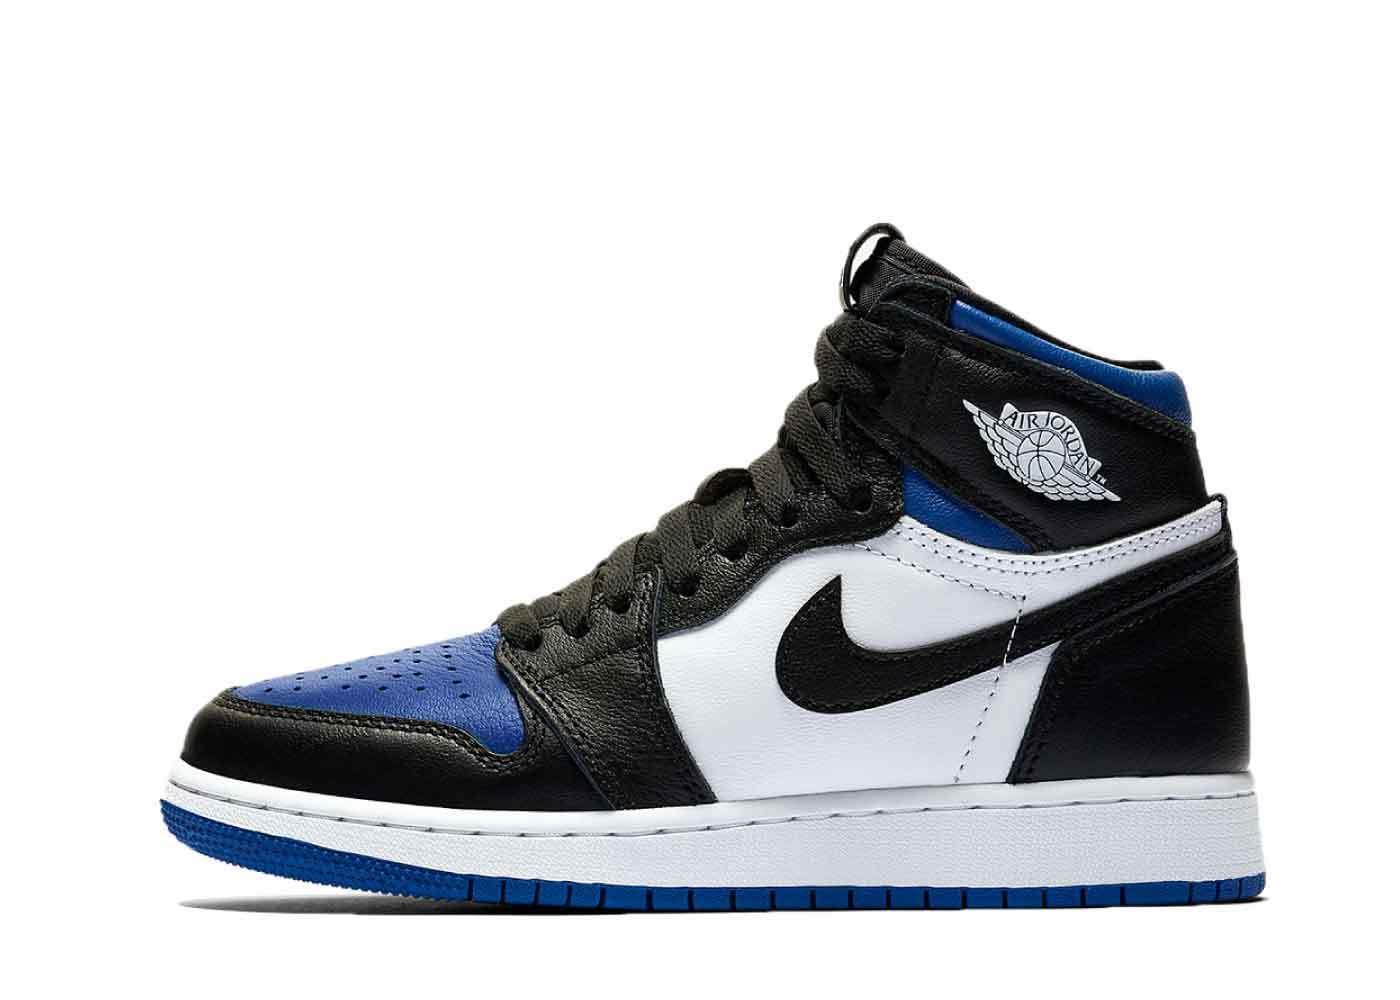 Nike Air Jordan 1 Retro High OG Royal Toe (GS)の写真